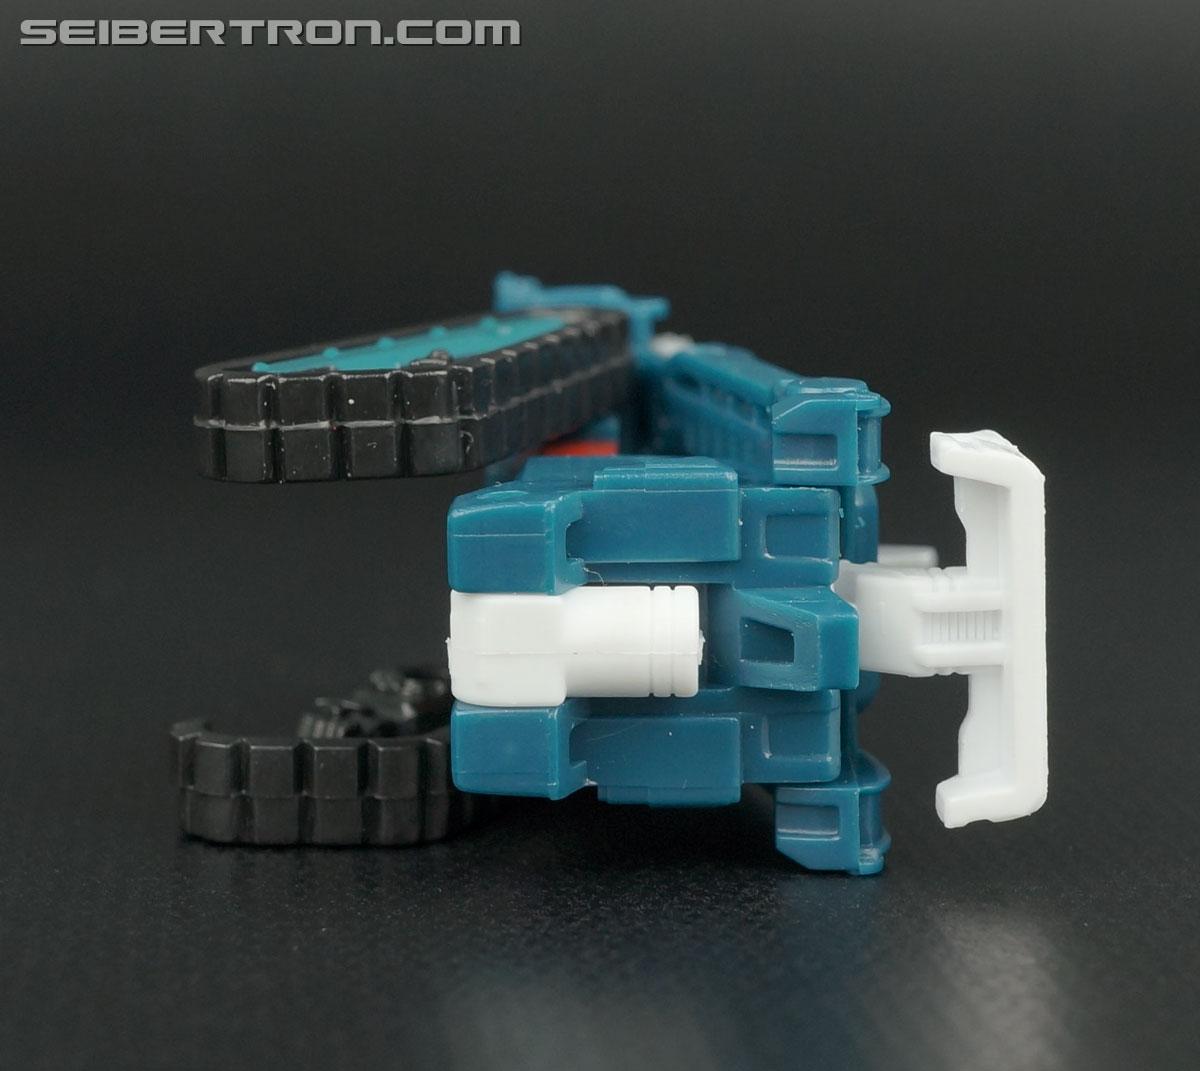 Transformers Legends Groundshaker (Image #56 of 66)